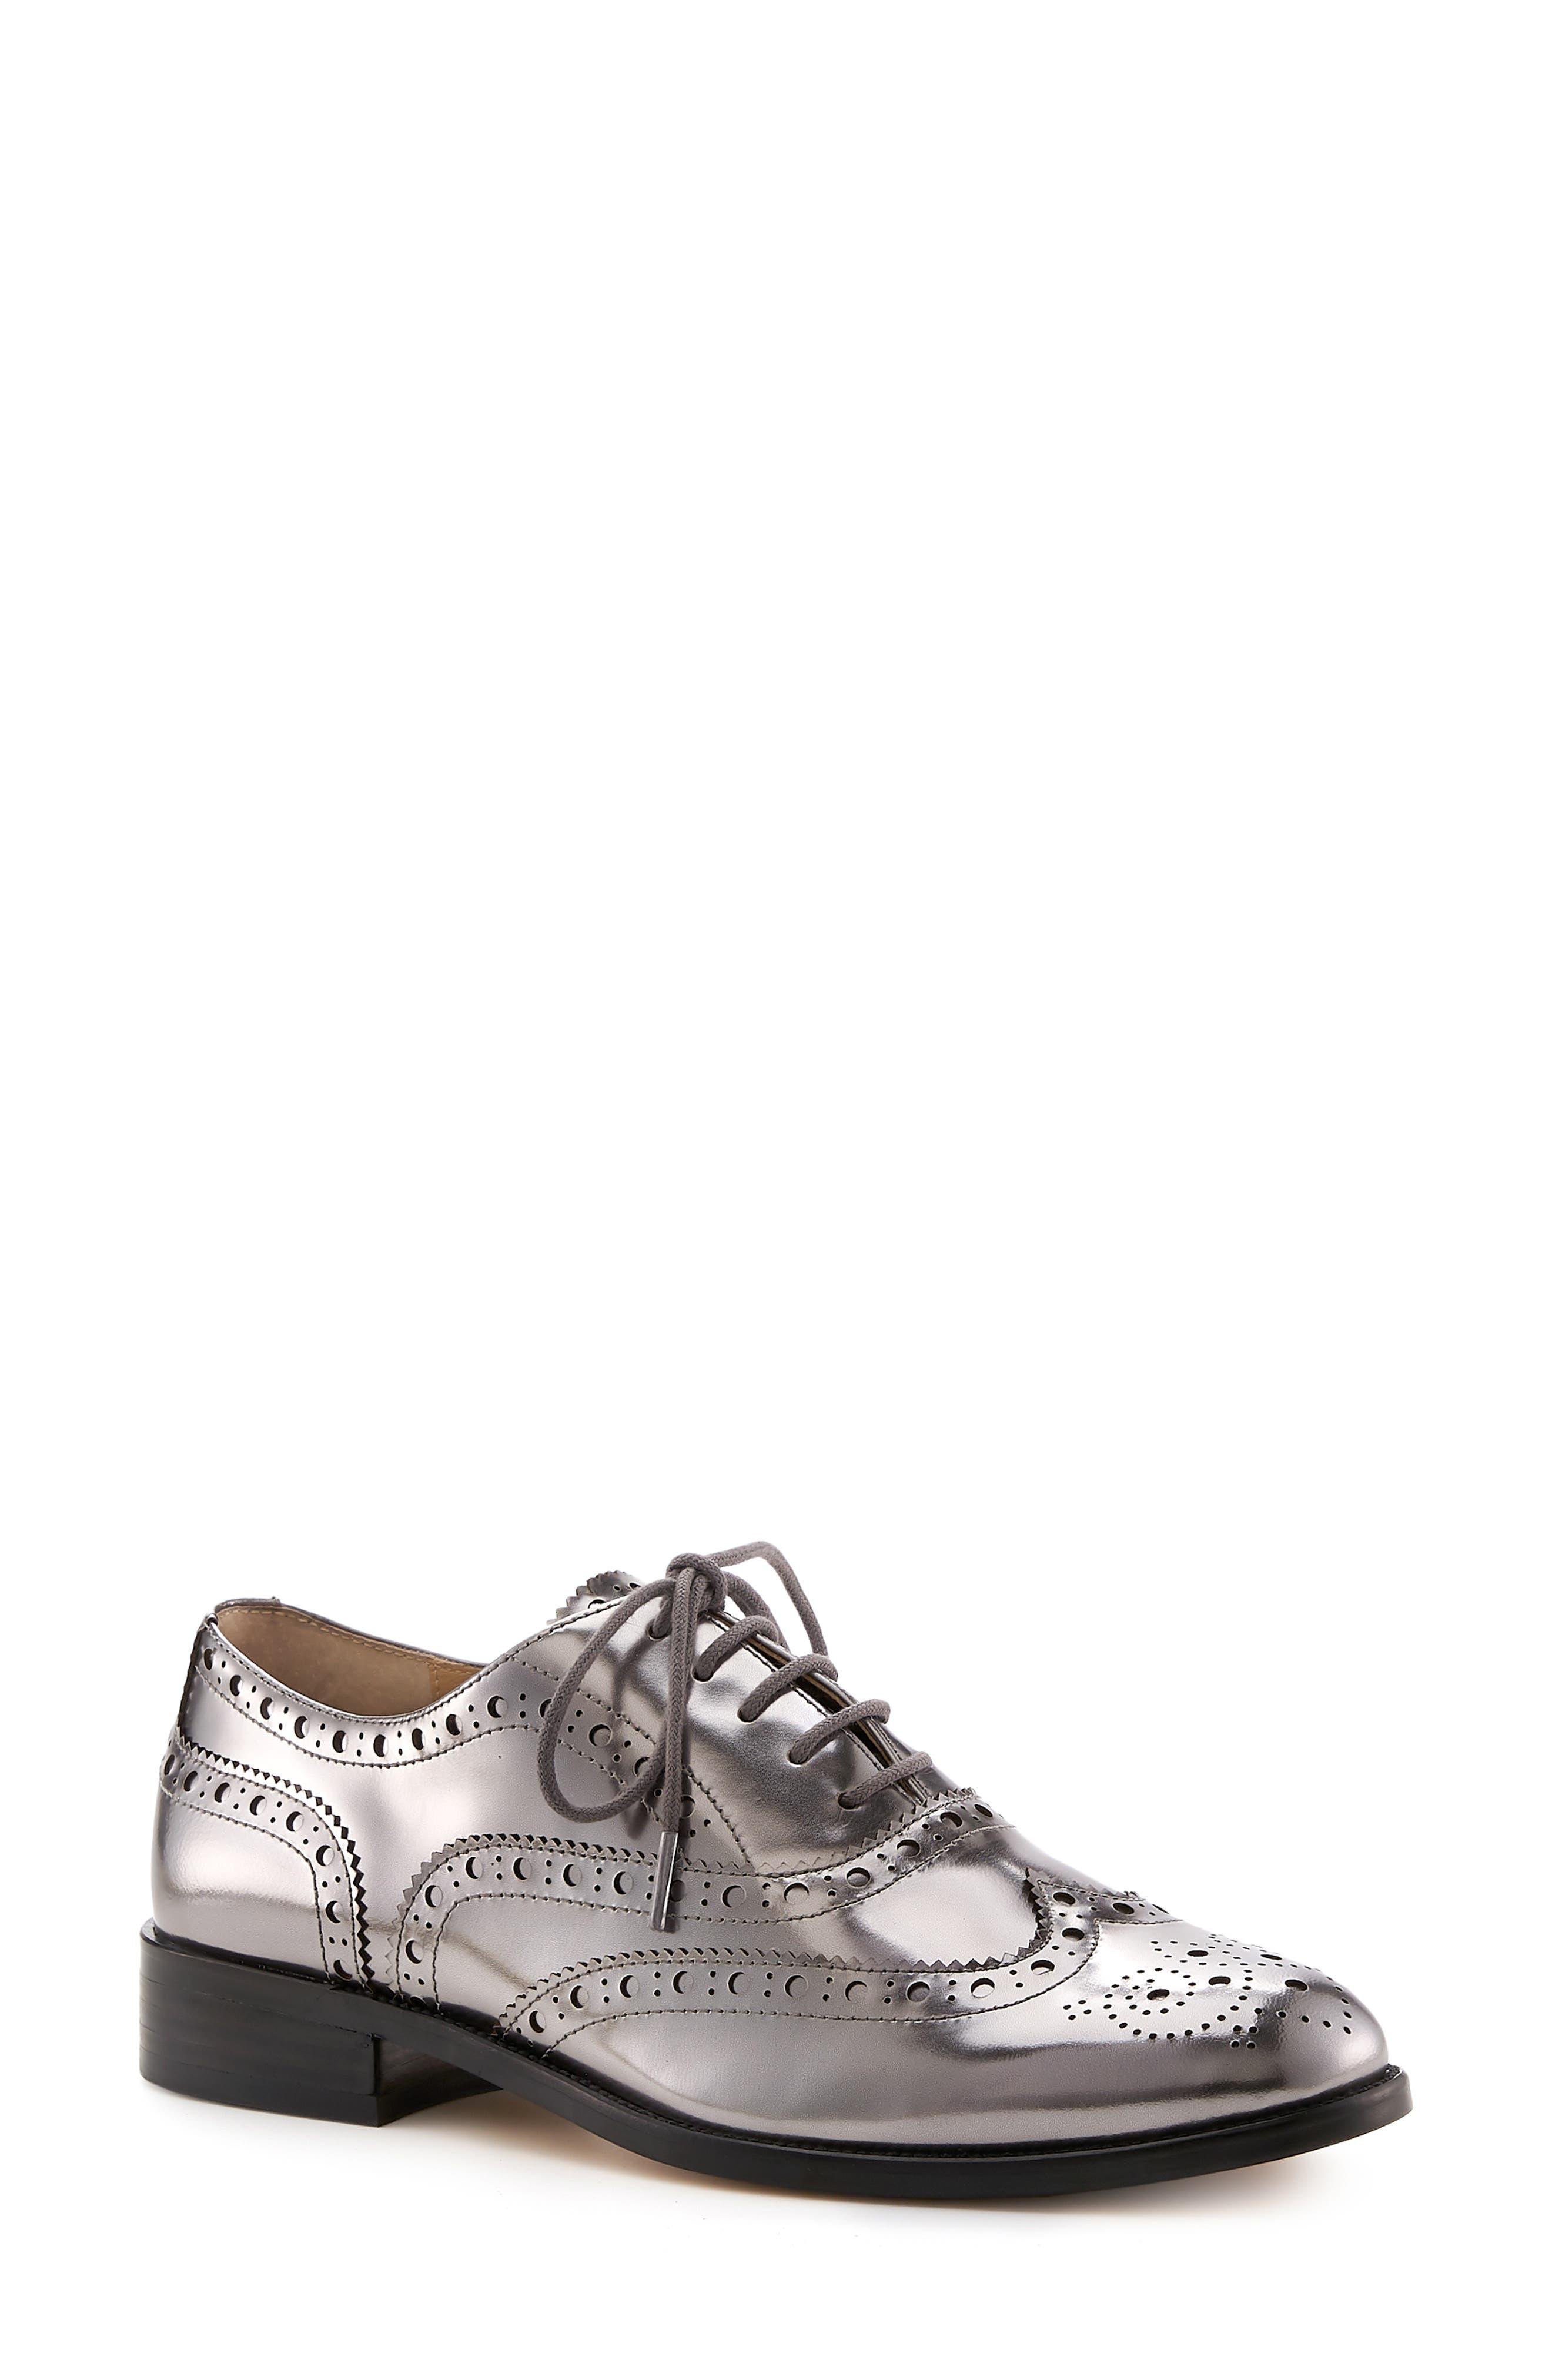 Women'S Callista Metallic Wingtip Oxford Loafers in Pewter